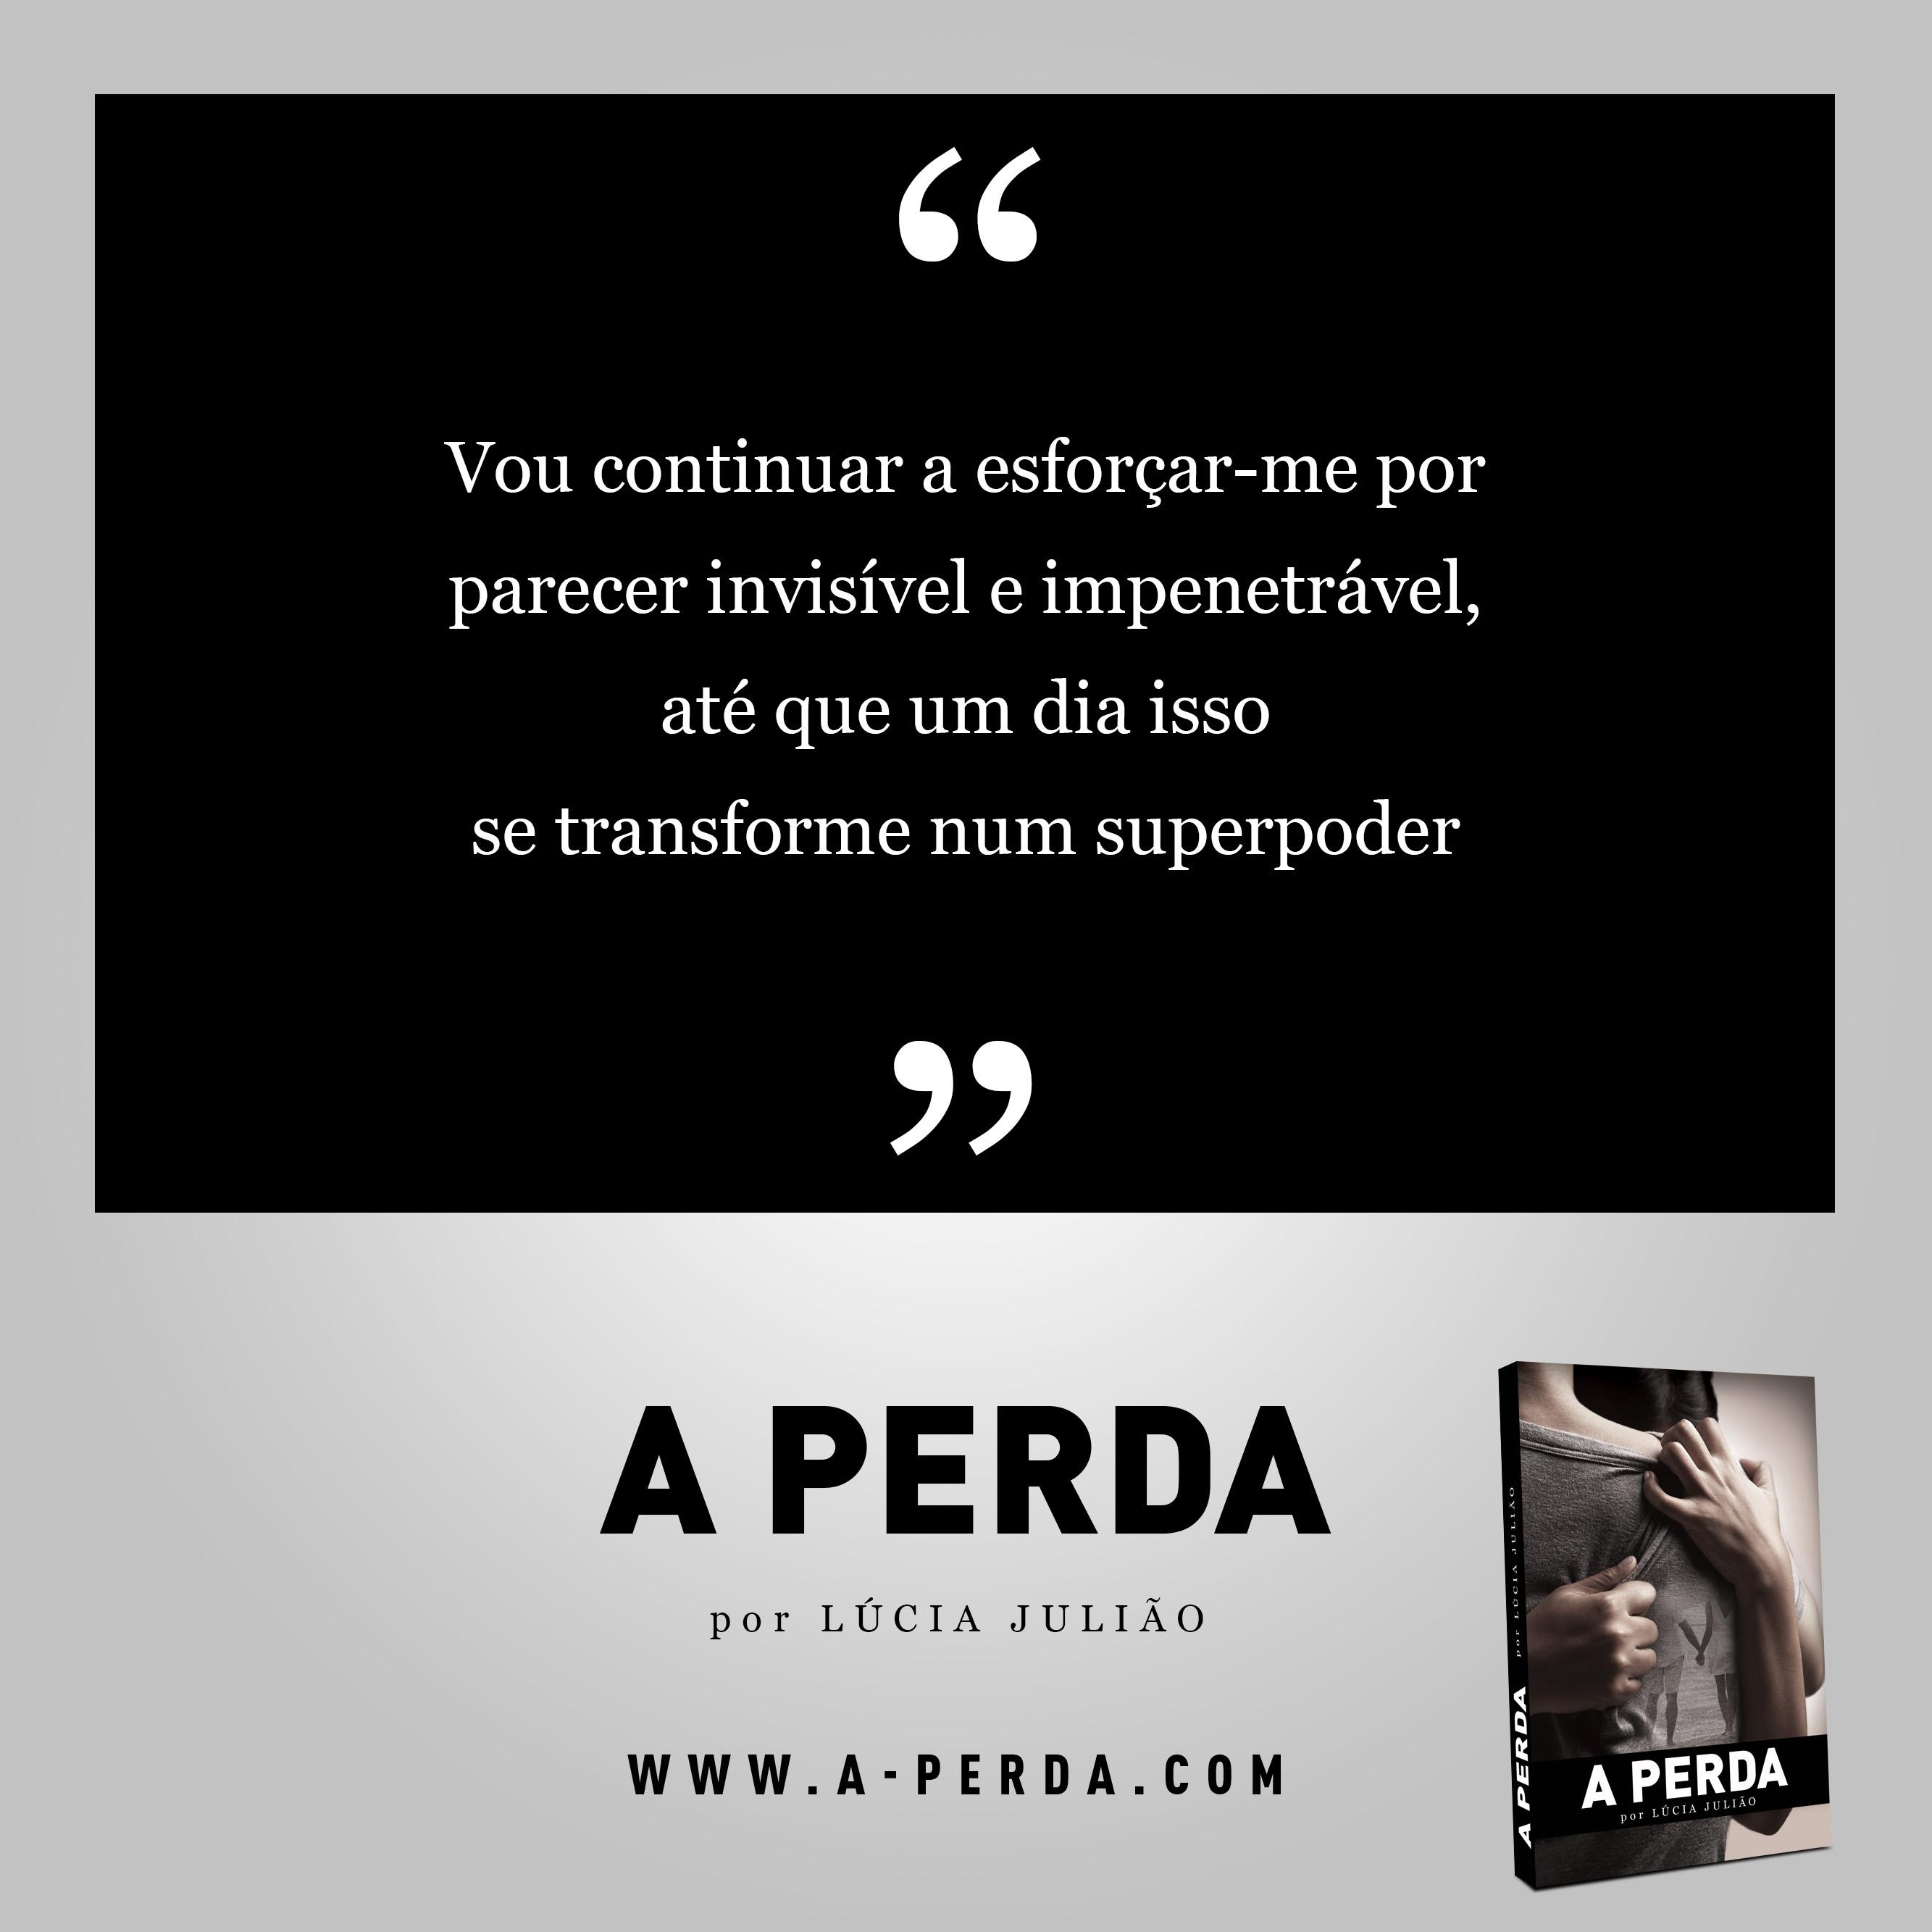 002-capitulo-26-livro-a-Perda-de-Lucia-Juliao-instagram